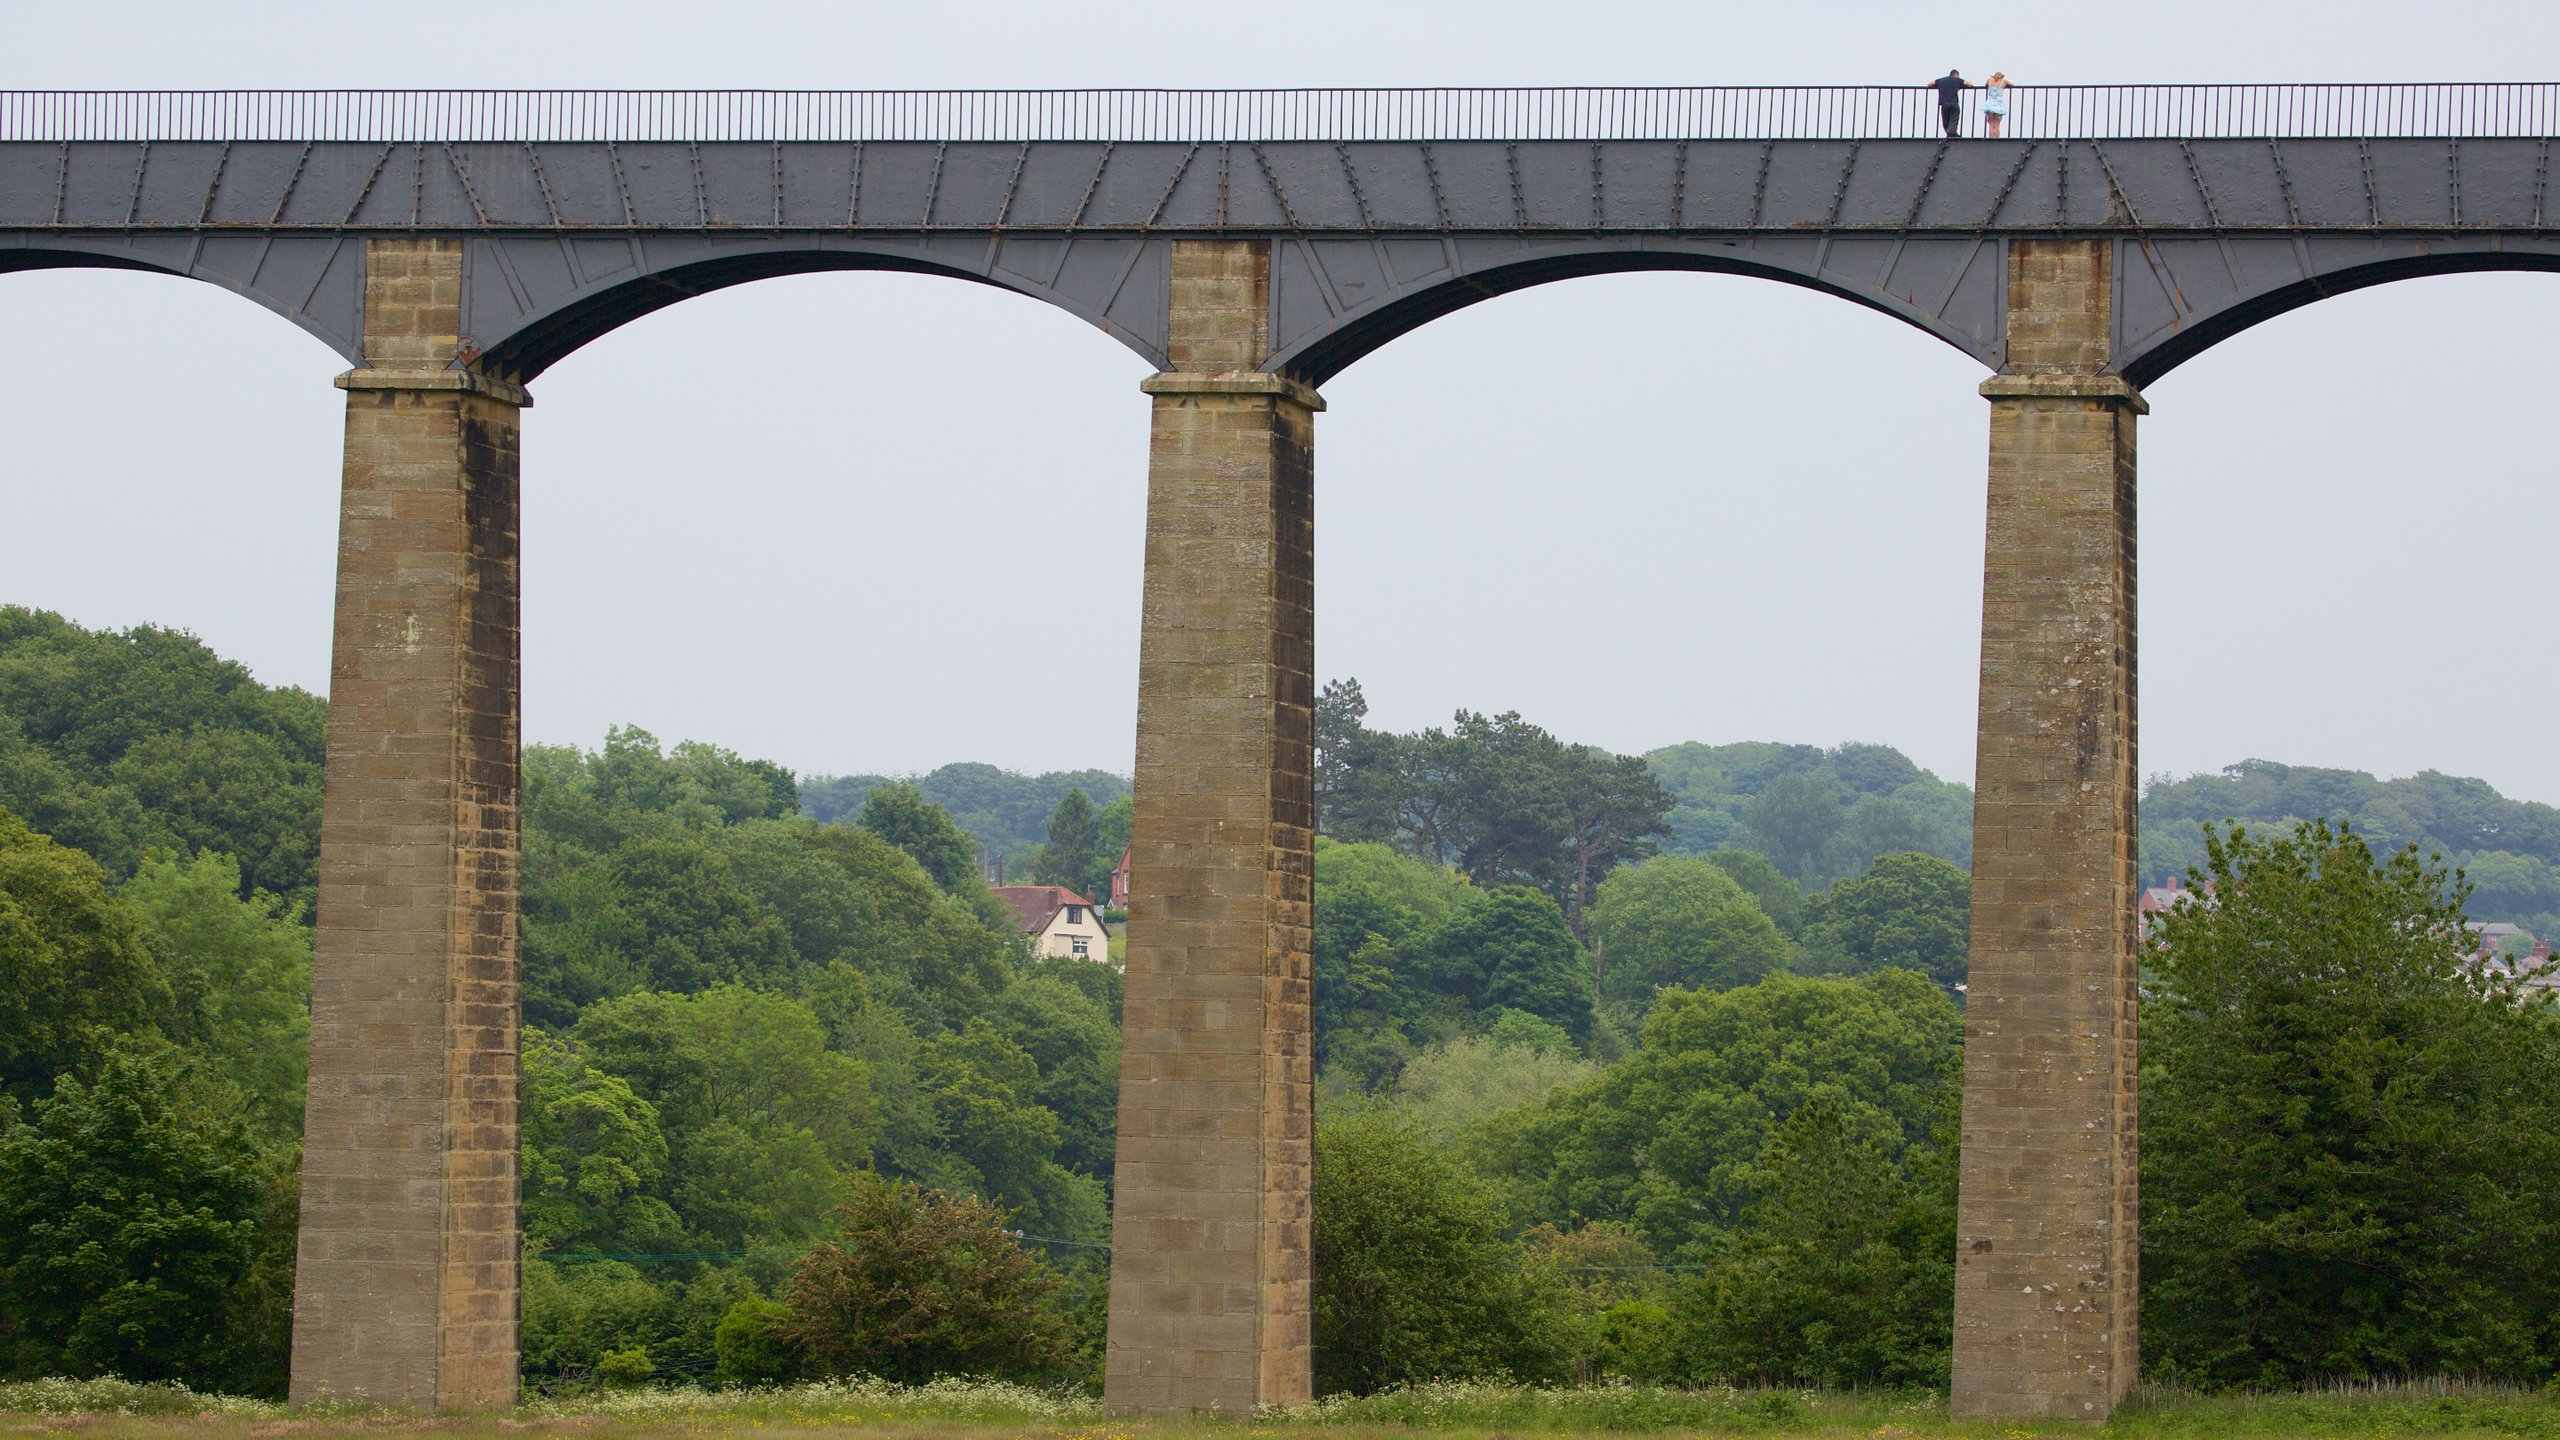 Pontcysyllte Aquaduct, Wales, United Kingdom